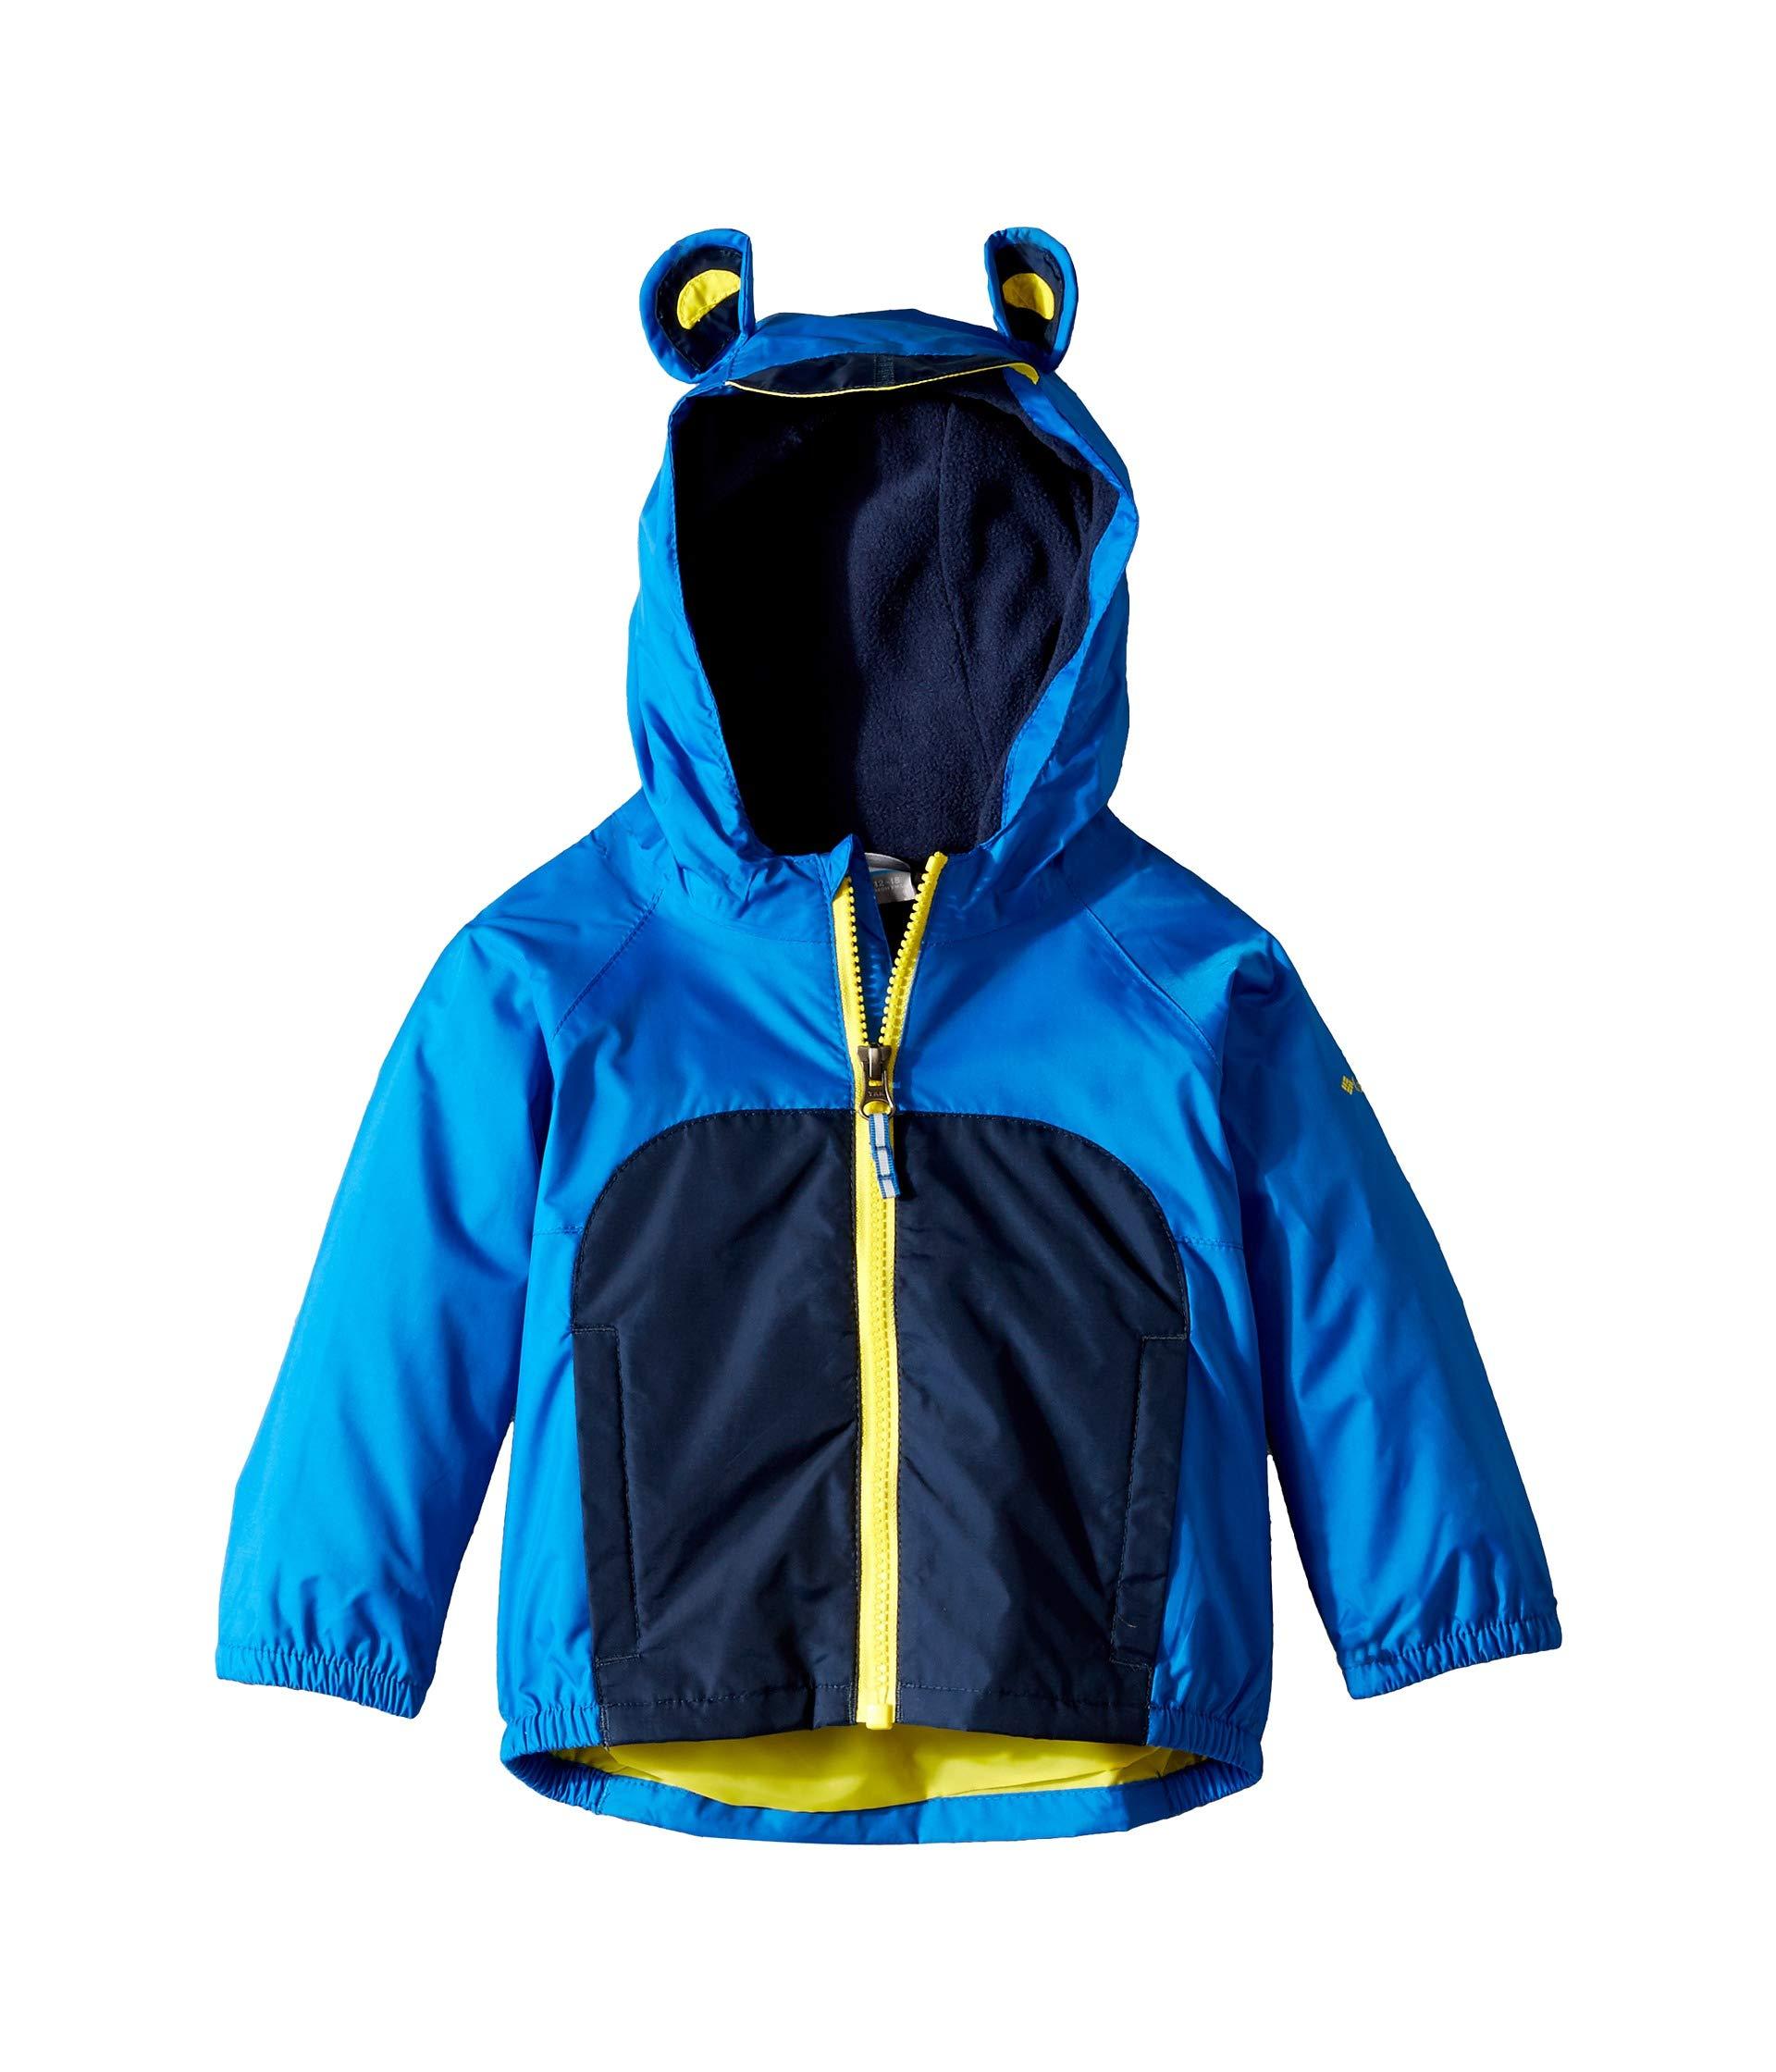 Columbia Kids Baby Boy's Kitteribbit¿ Fleece Lined Rain Jacket (Infant/Toddler) Super Blue/Collegiate Navy/Autzen 6-12 Months